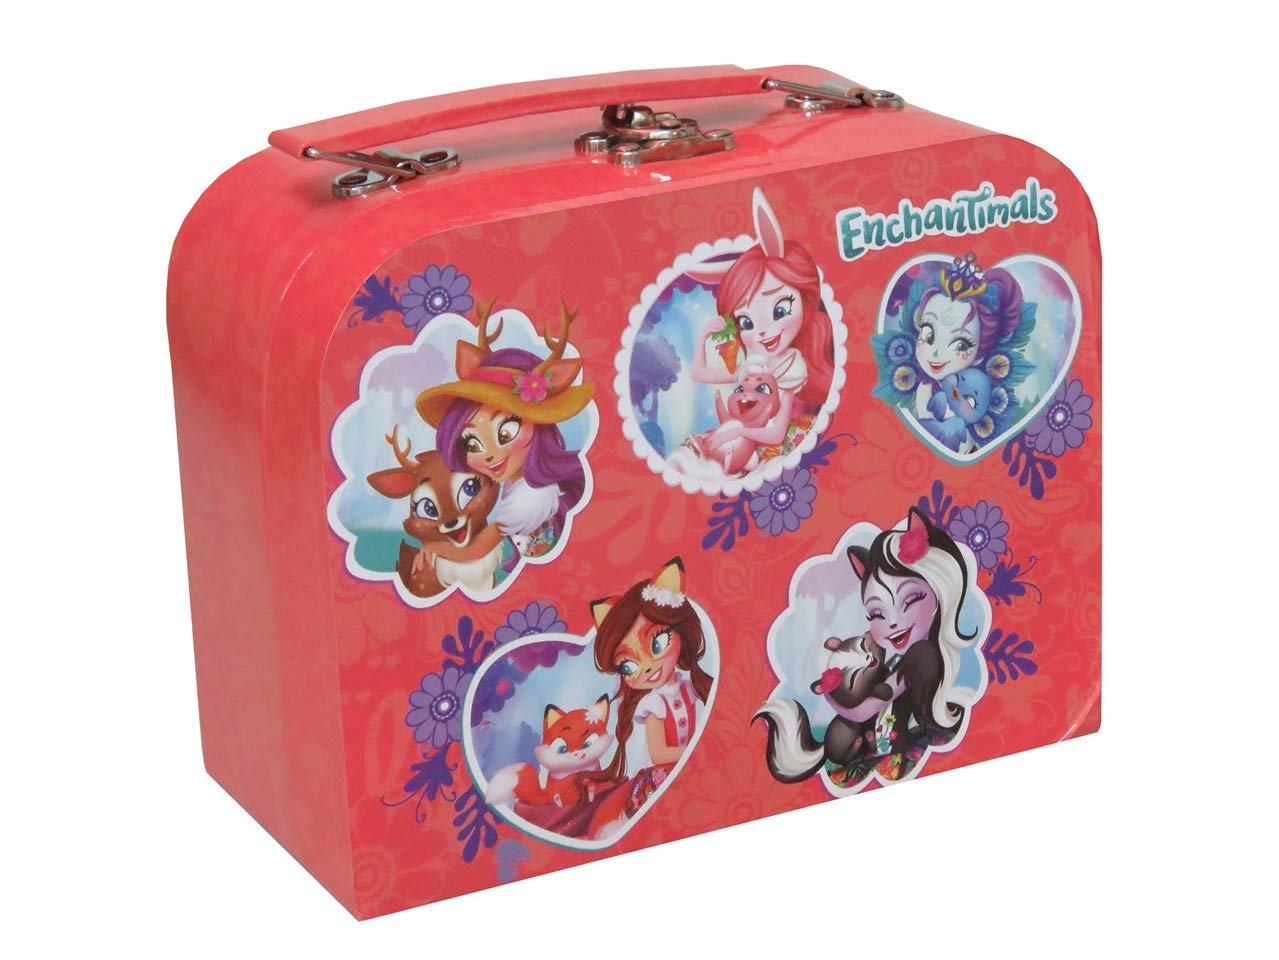 Enchantimals Jewelry Briefcase